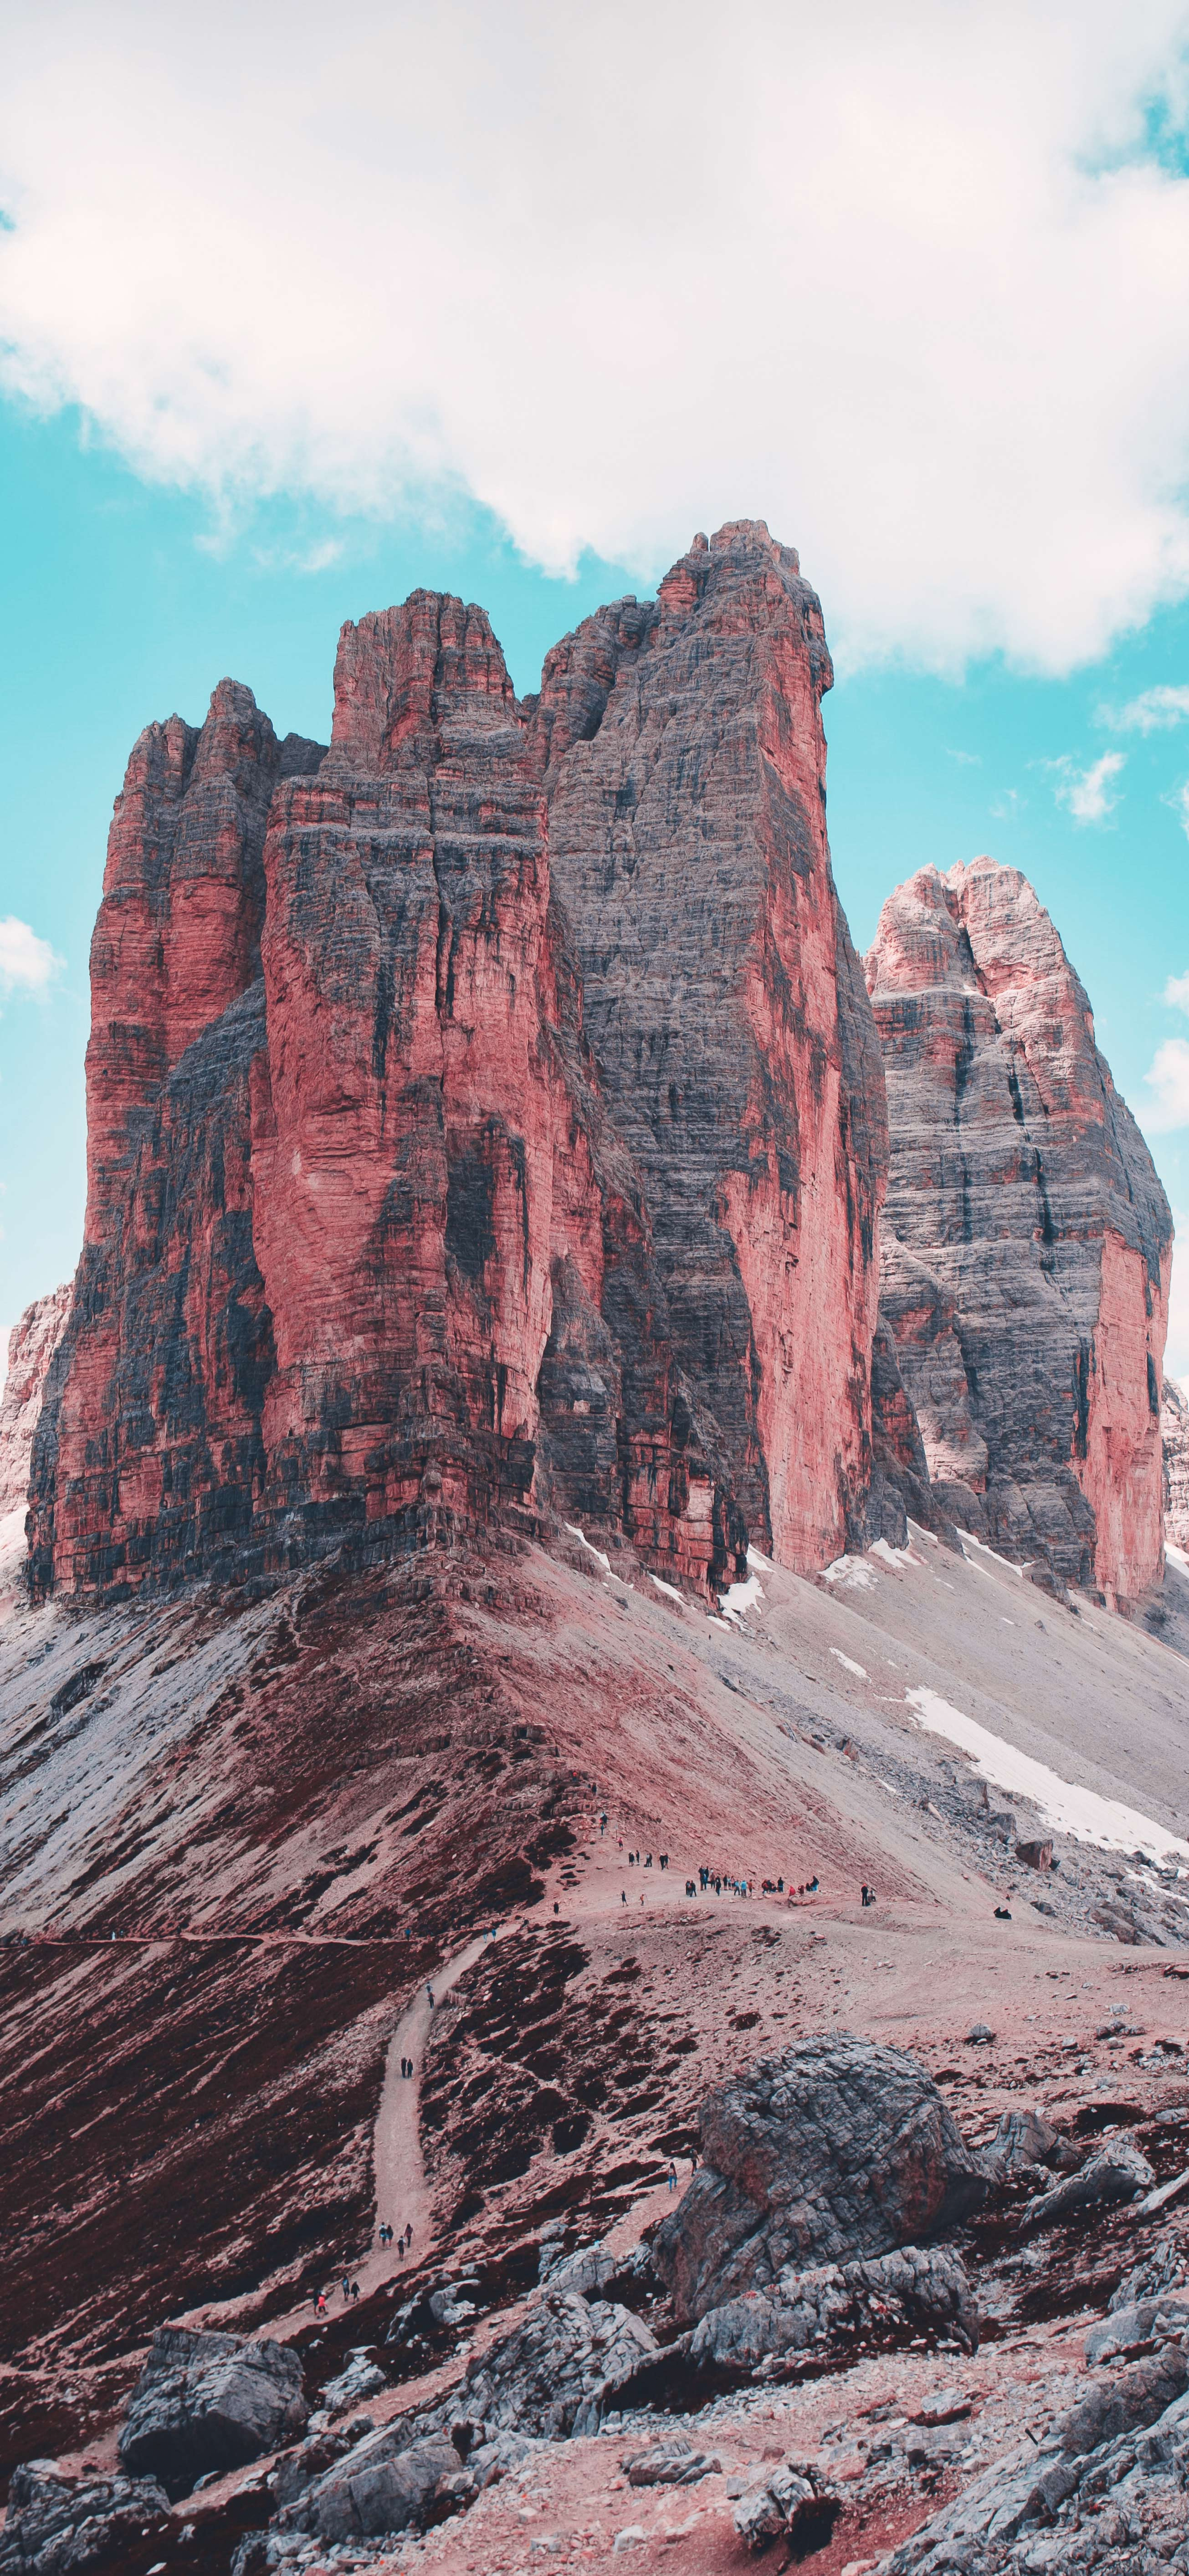 brown-rocky-mountain-under-blue-sky-wallpaper